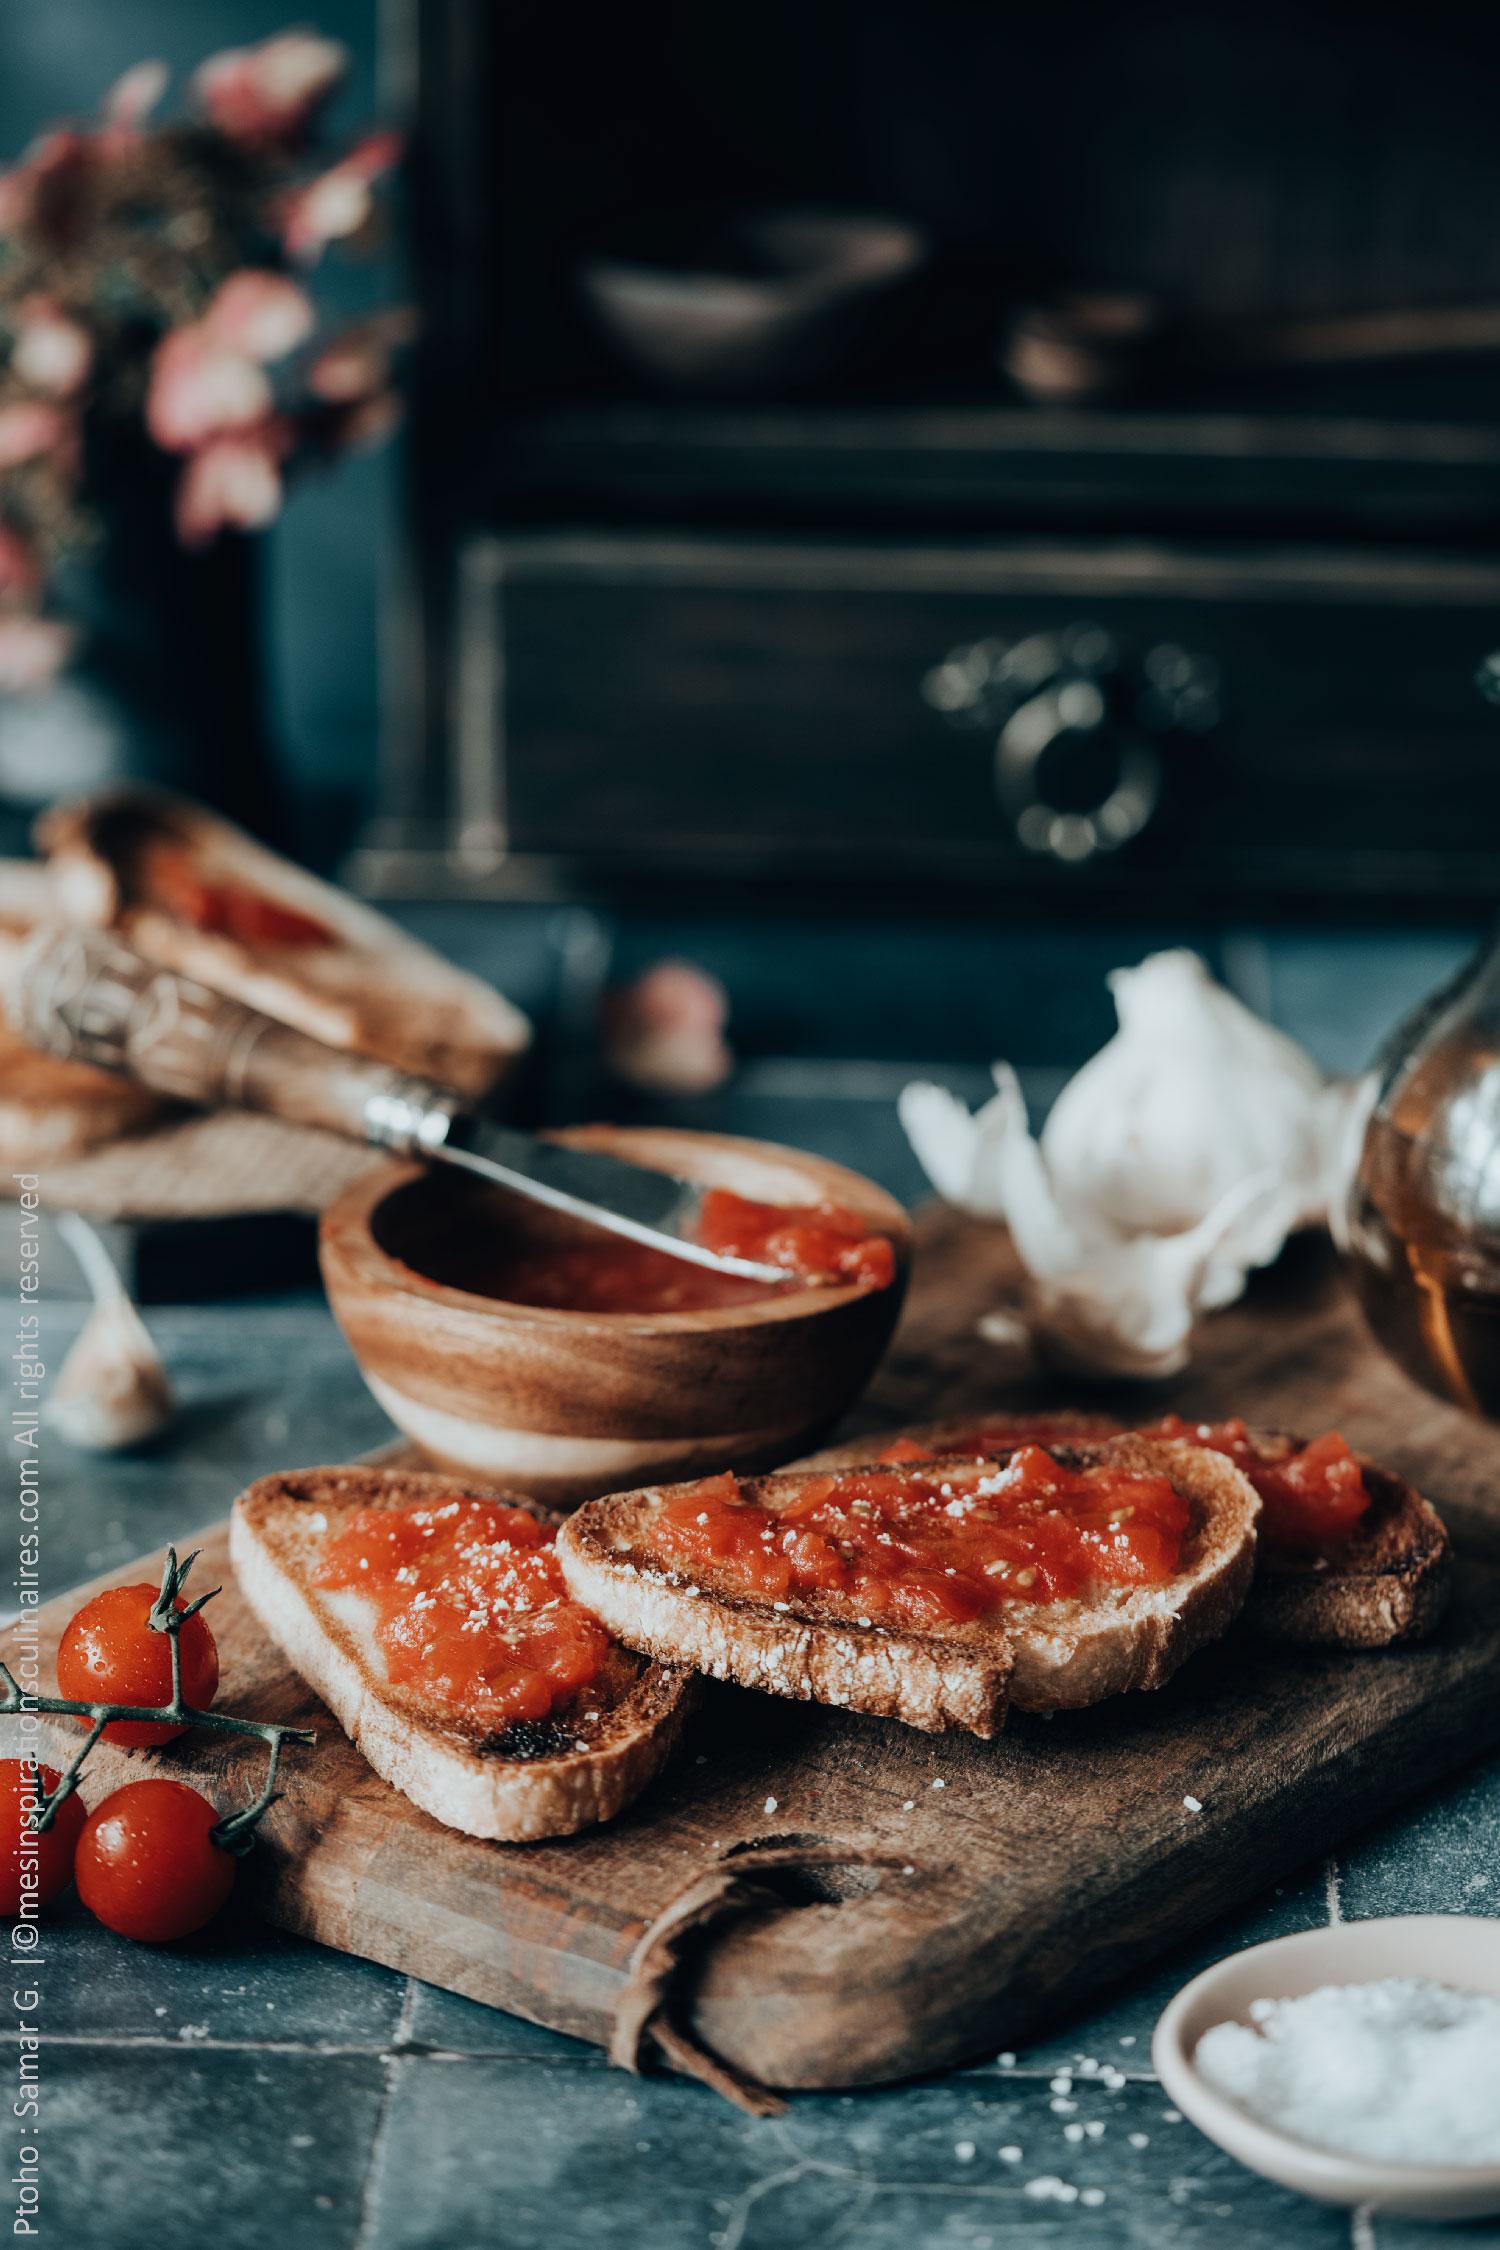 pan con tomates catalane (pa amb tomàquet)